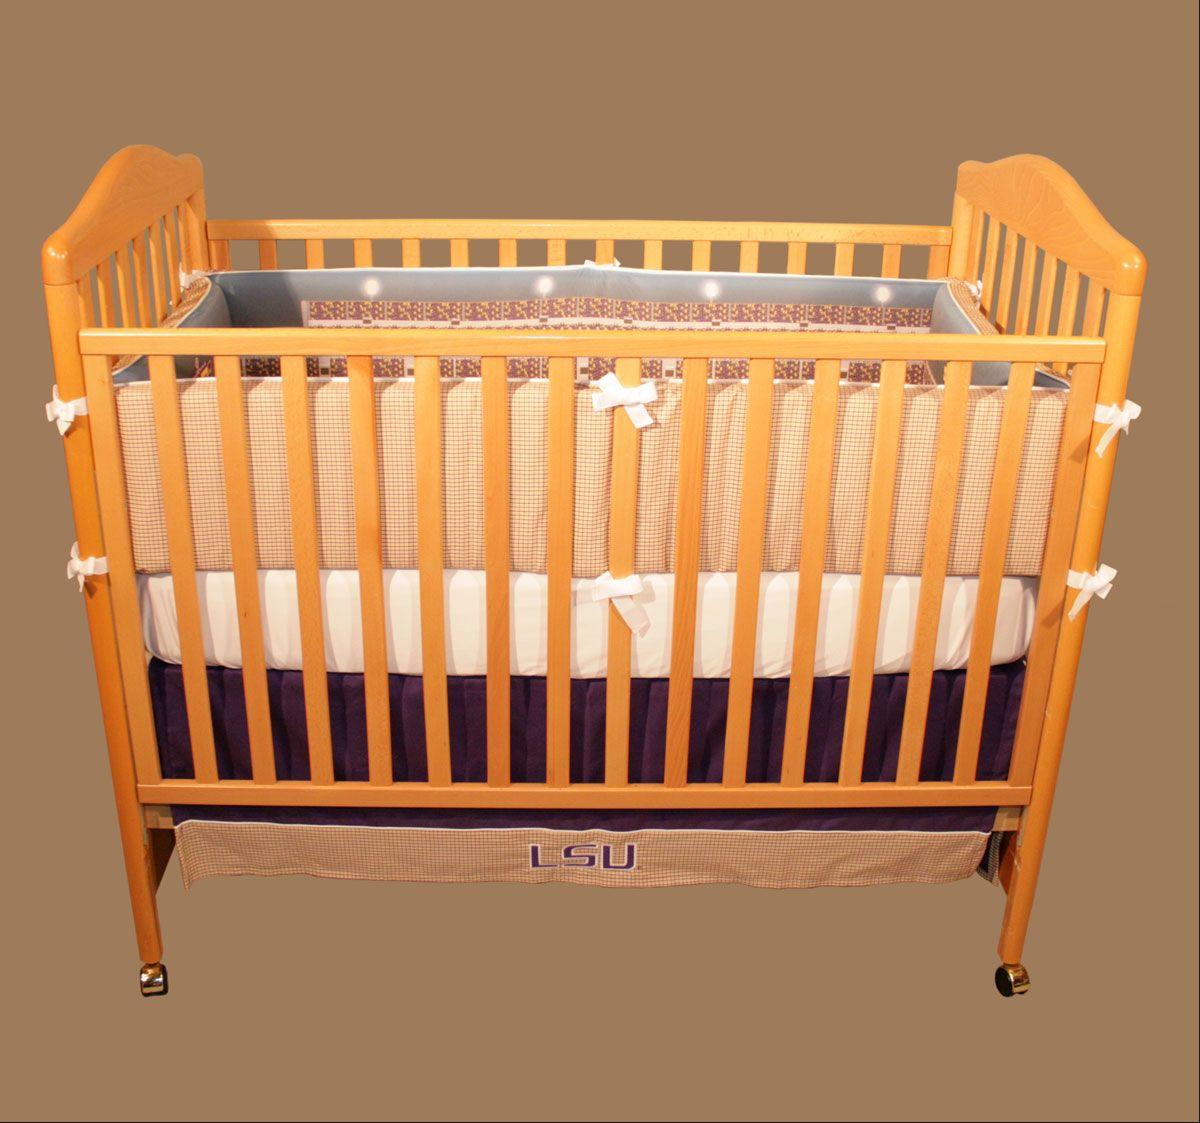 lsu stadium crib bedding set | random | pinterest | baby baby